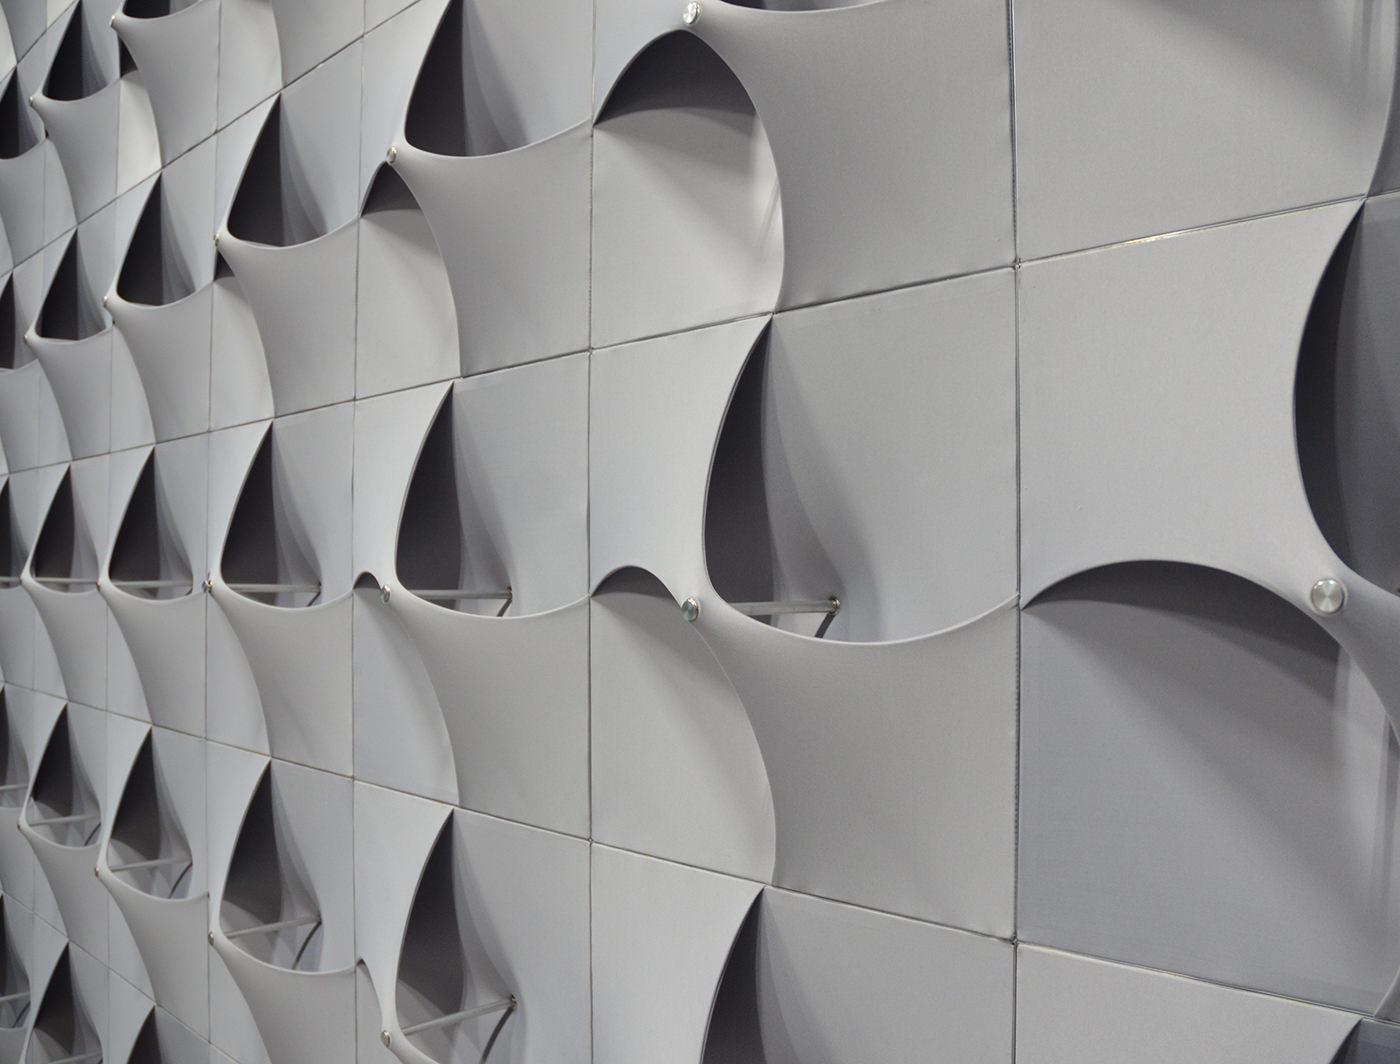 Turbine Panels in Natural Light